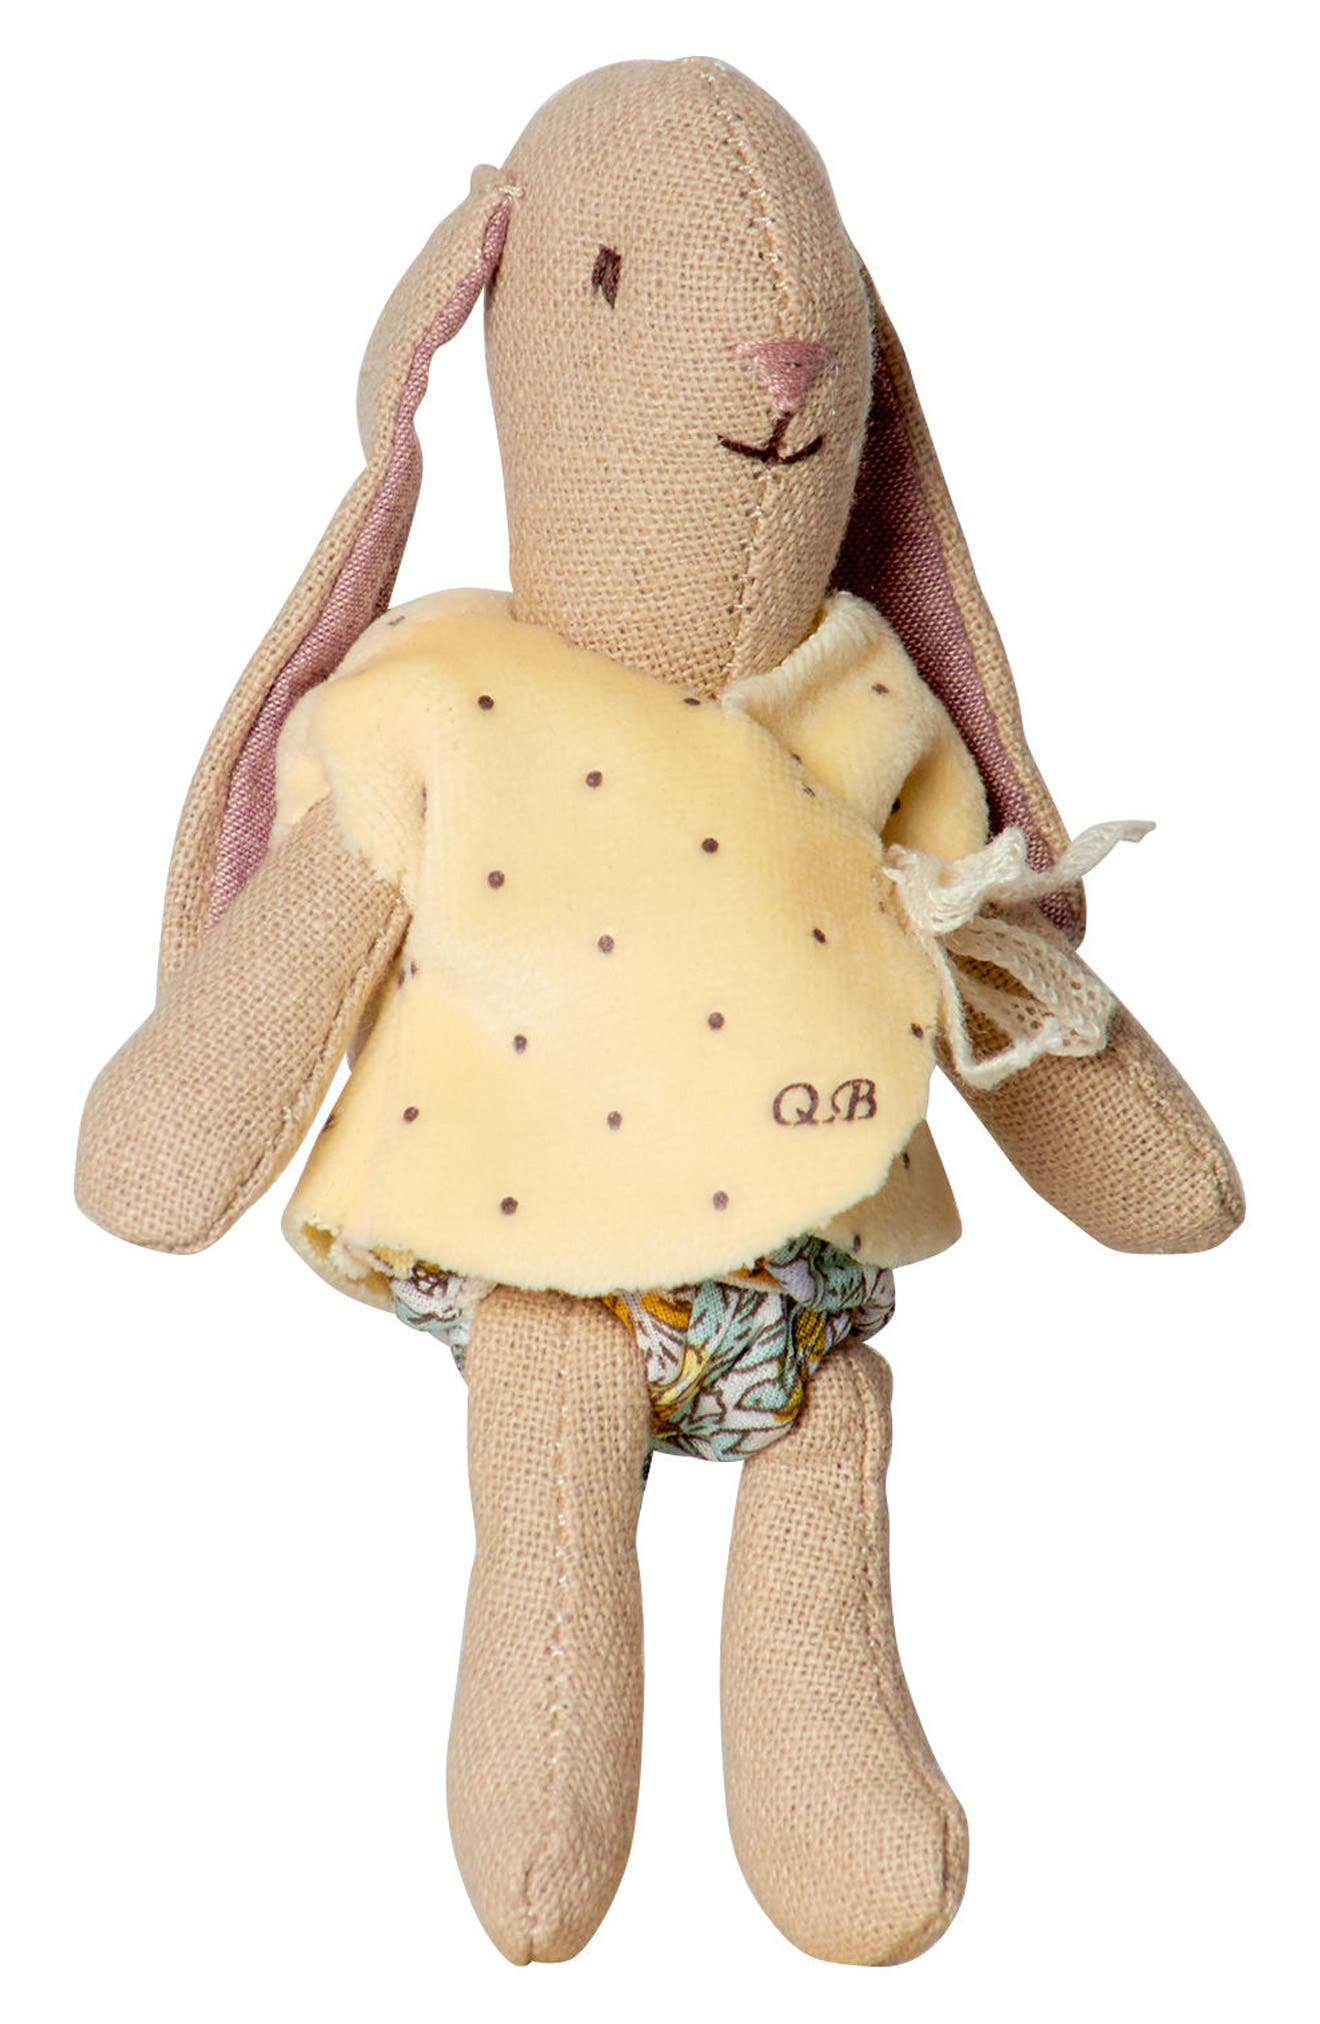 Micro Rabbit Doll Toy,                             Main thumbnail 1, color,                             700